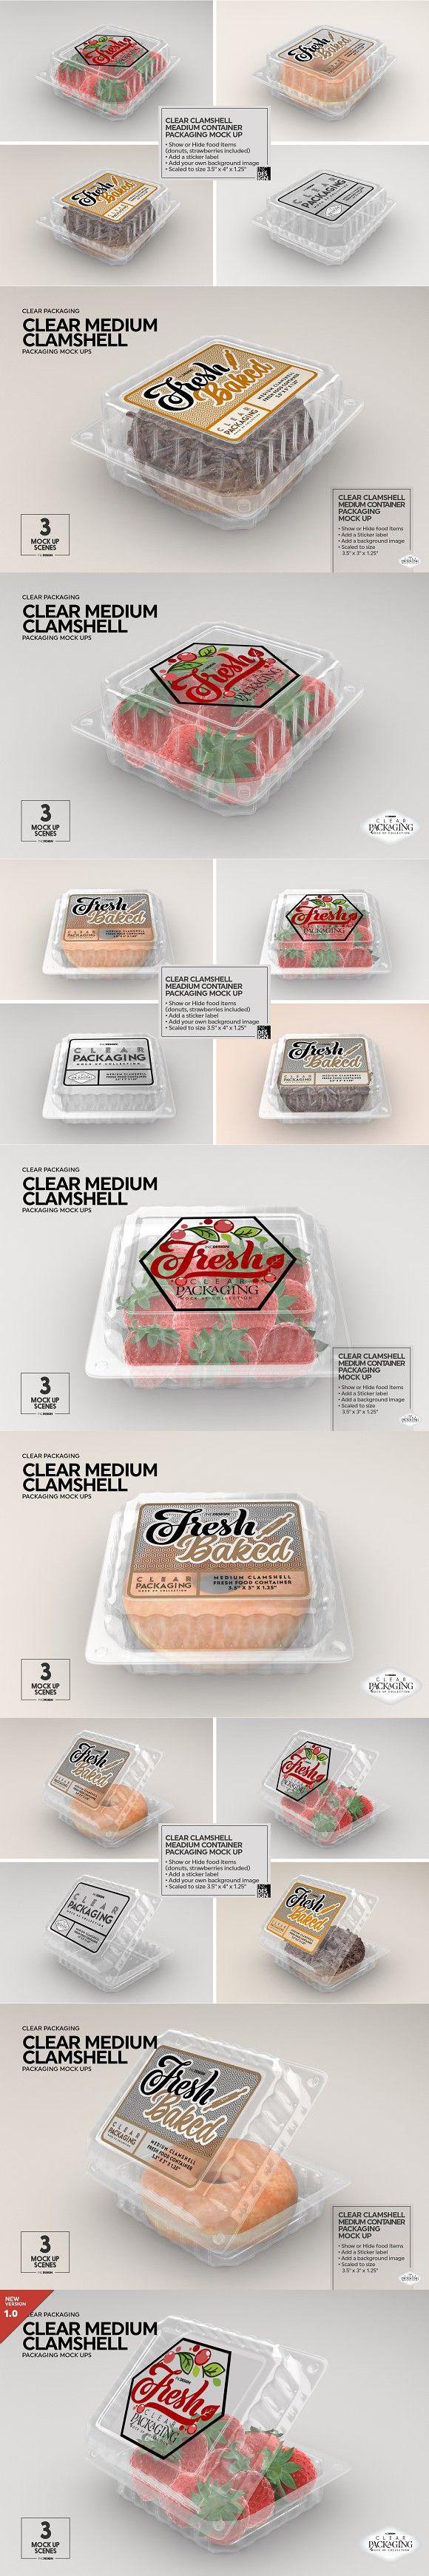 Download Medium Clamshell Packaging Mockup Food Mockup Clamshell Packaging Packaging Mockup